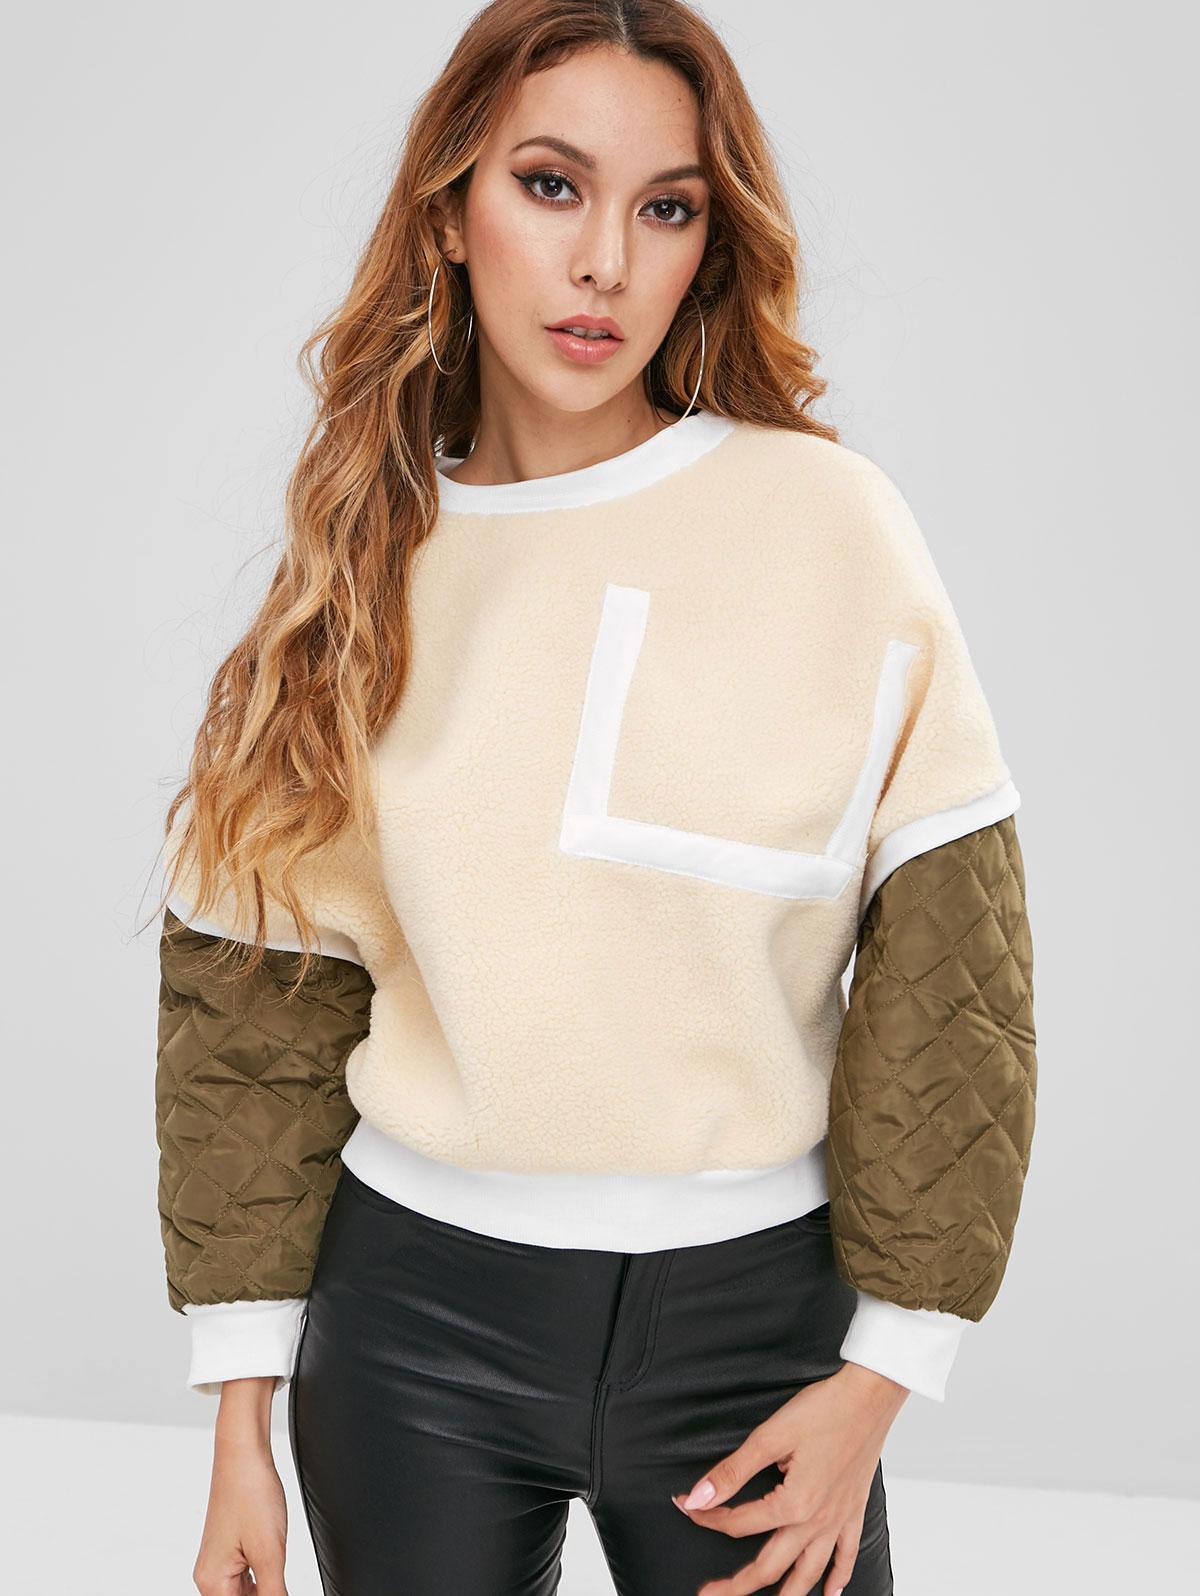 Patchwork Fuzzy Sweatshirt